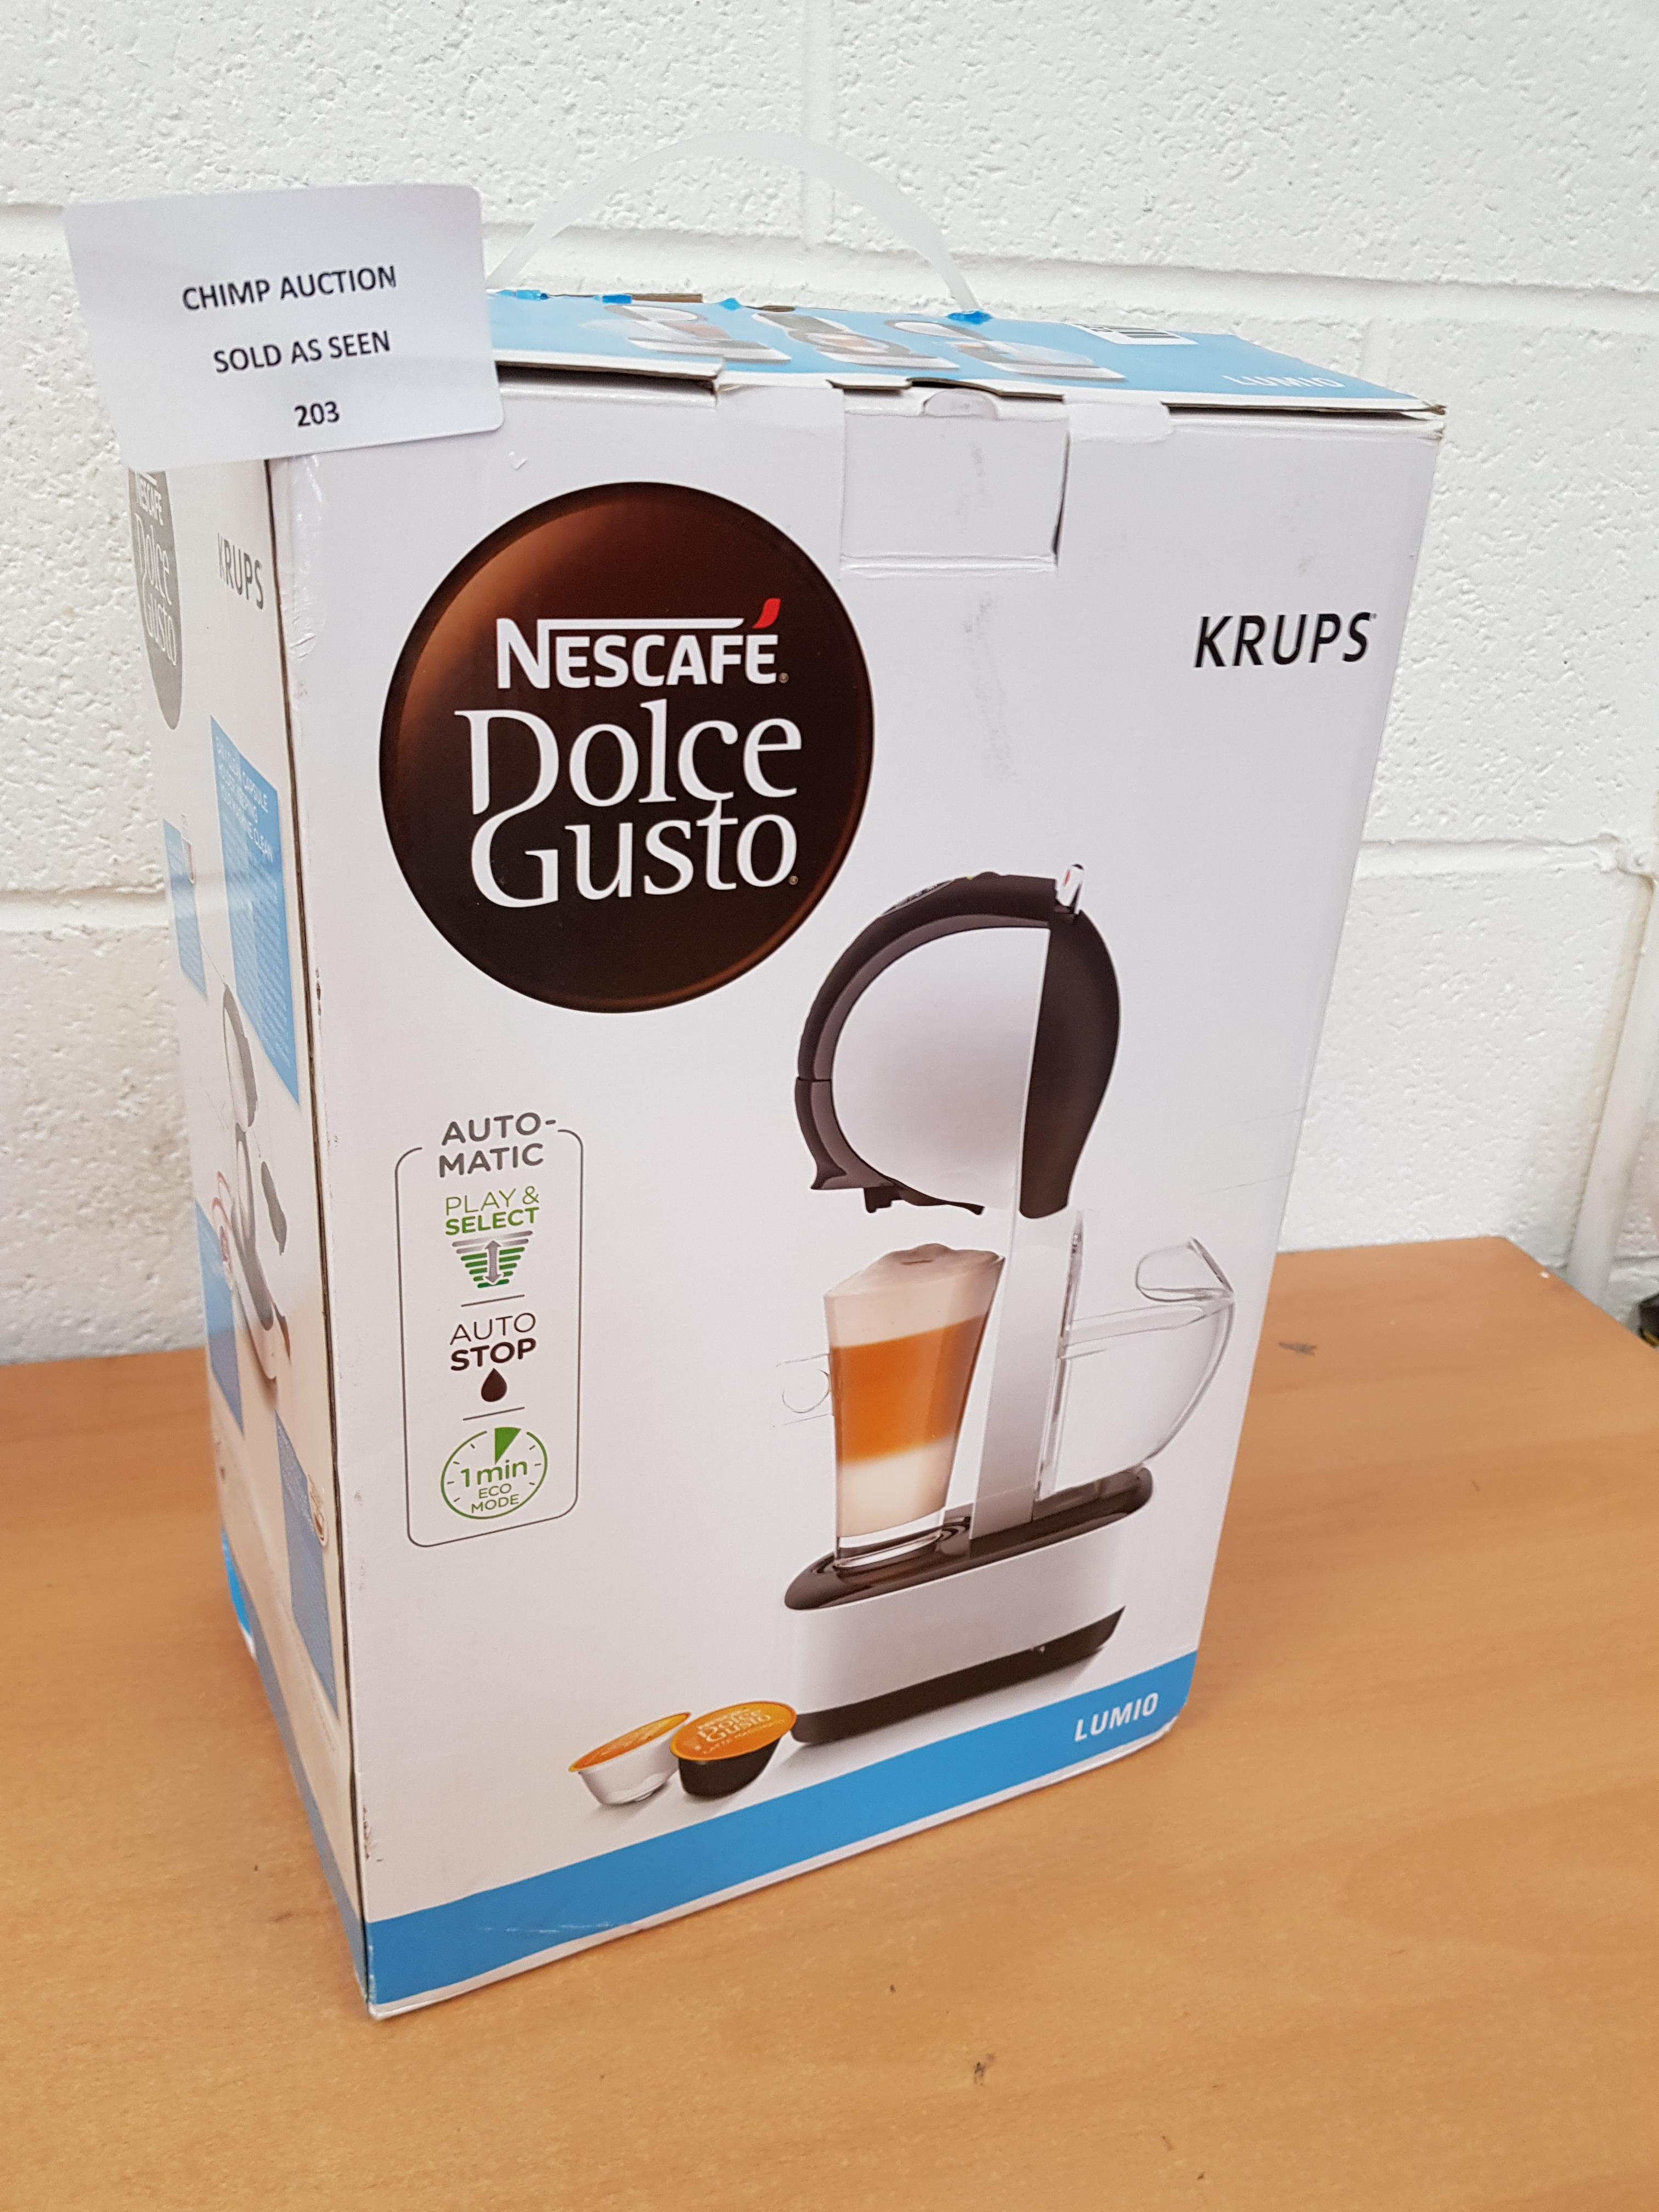 Lot 203 - Nescafé Dolce Gusto Krups Lumio Automatic Coffee Machine RRP £119.99